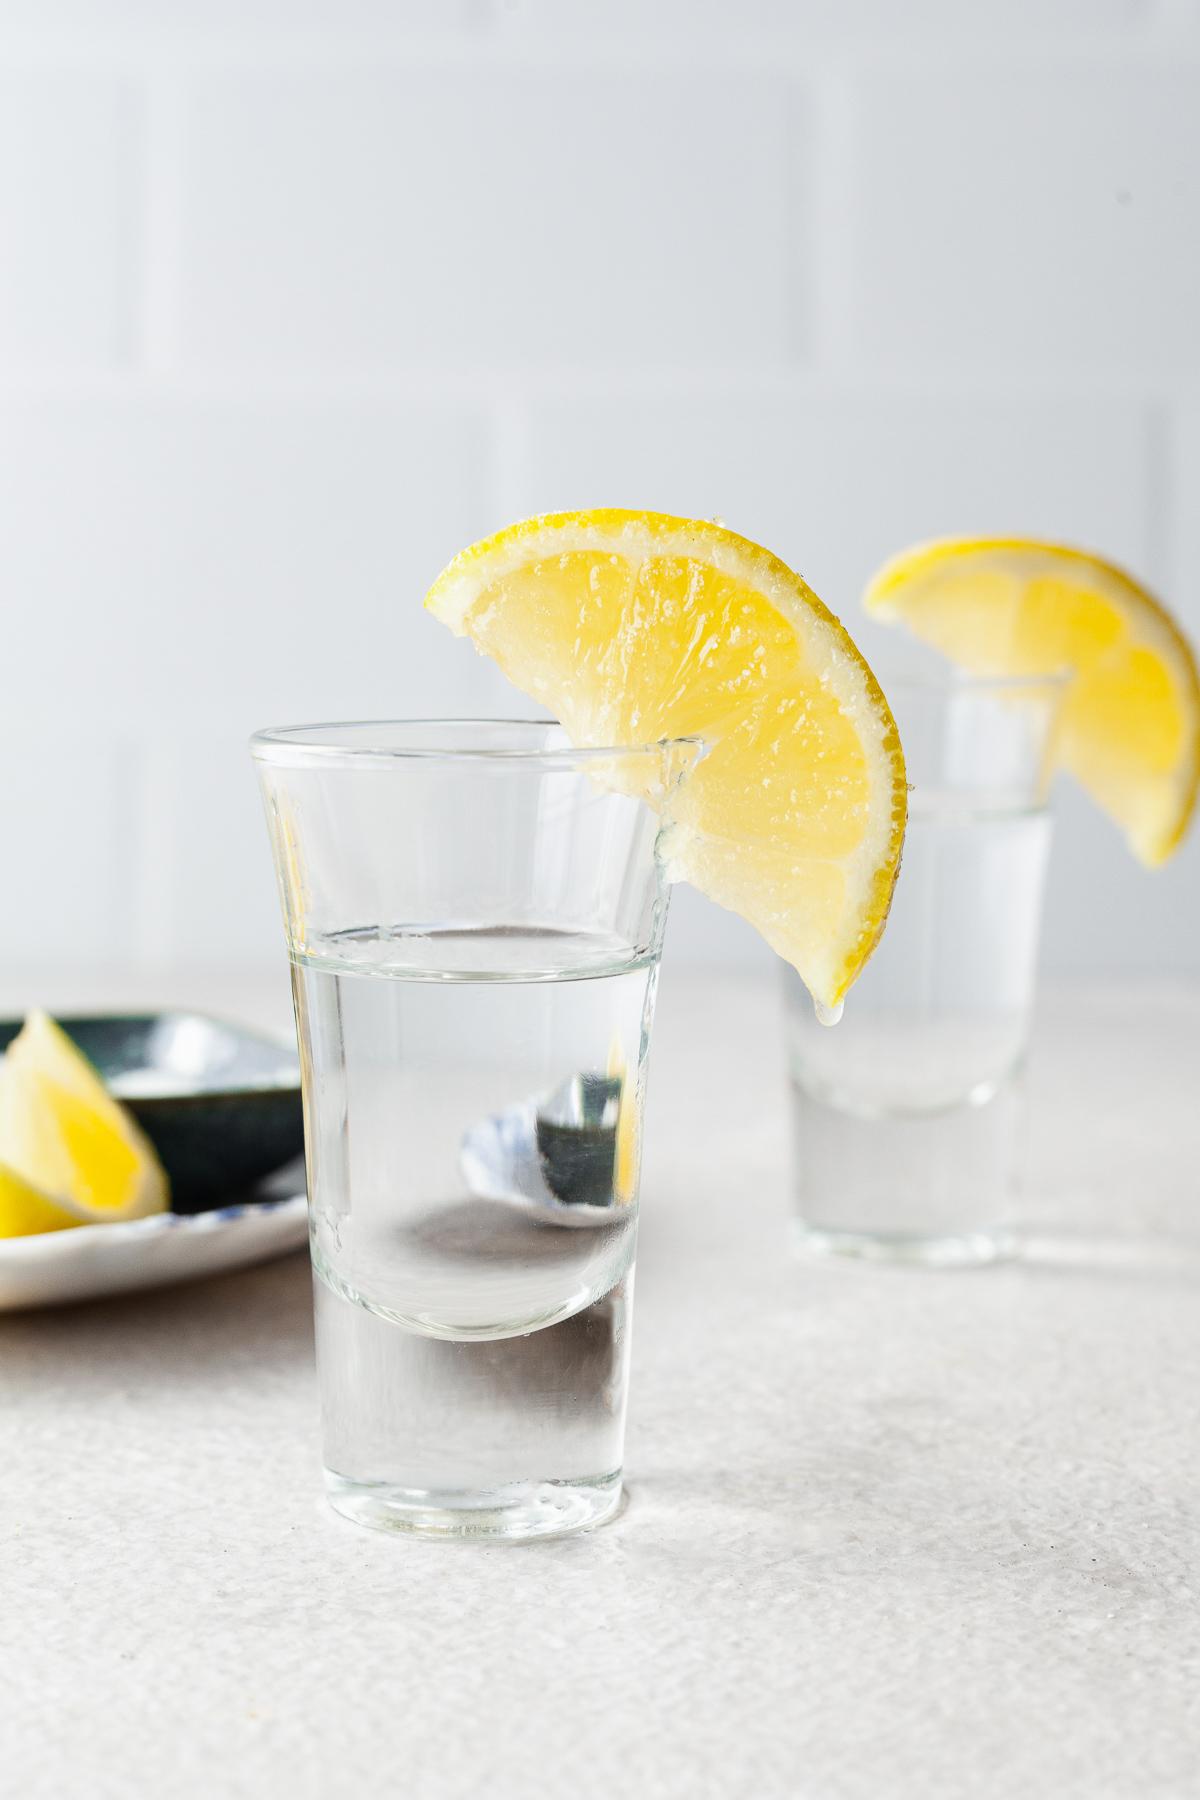 image of two lemon drop shots with lemon slices on glasses